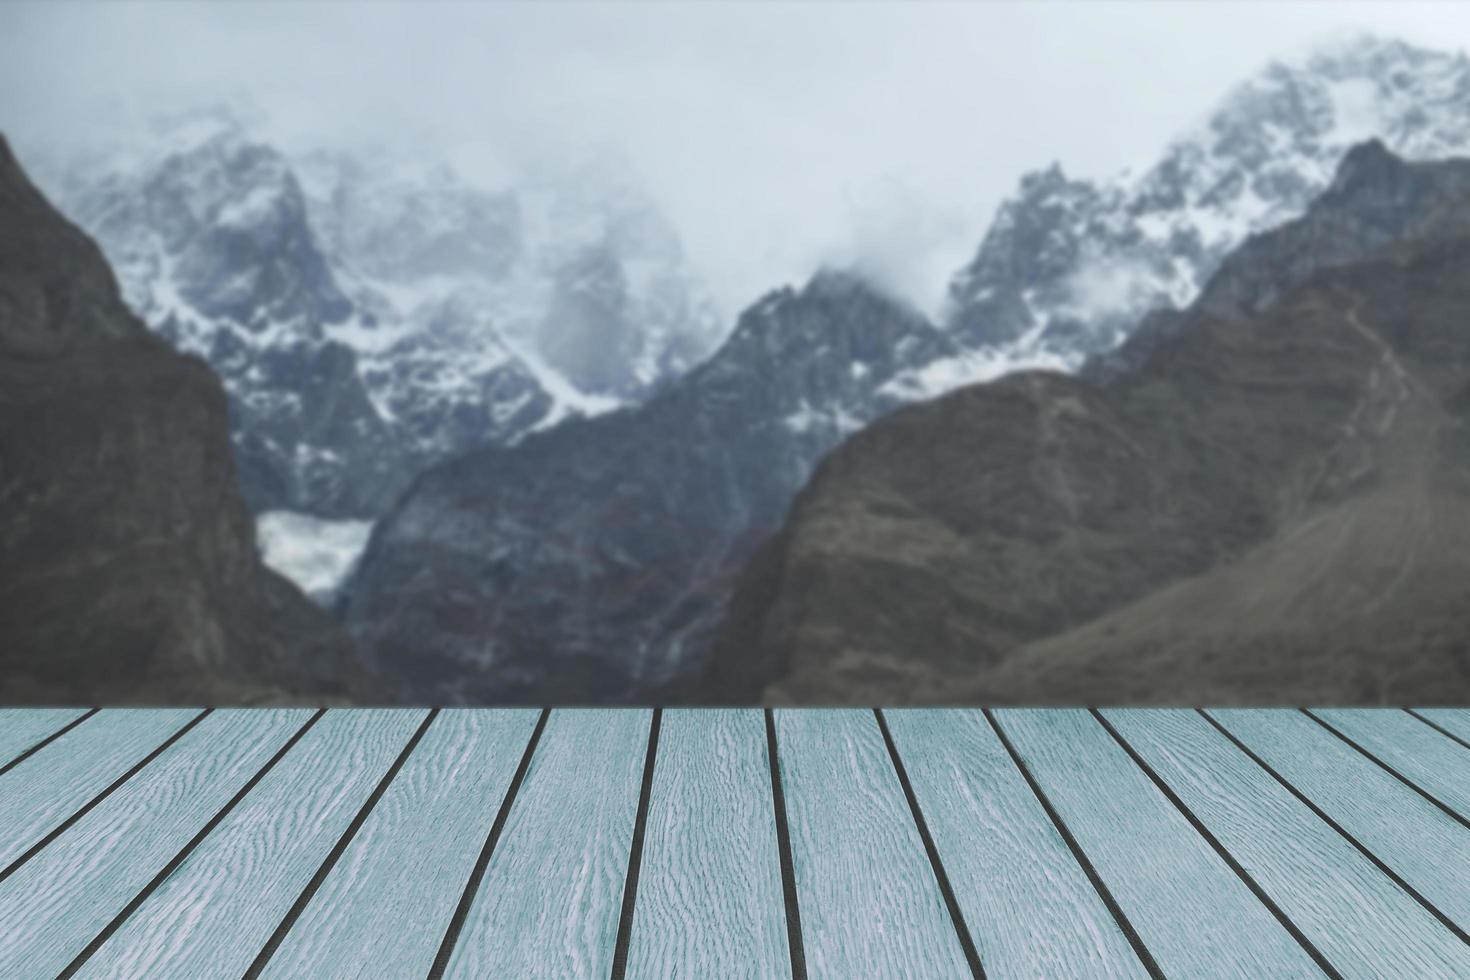 Holzbretter gegen schneebedeckte Bergkette foto